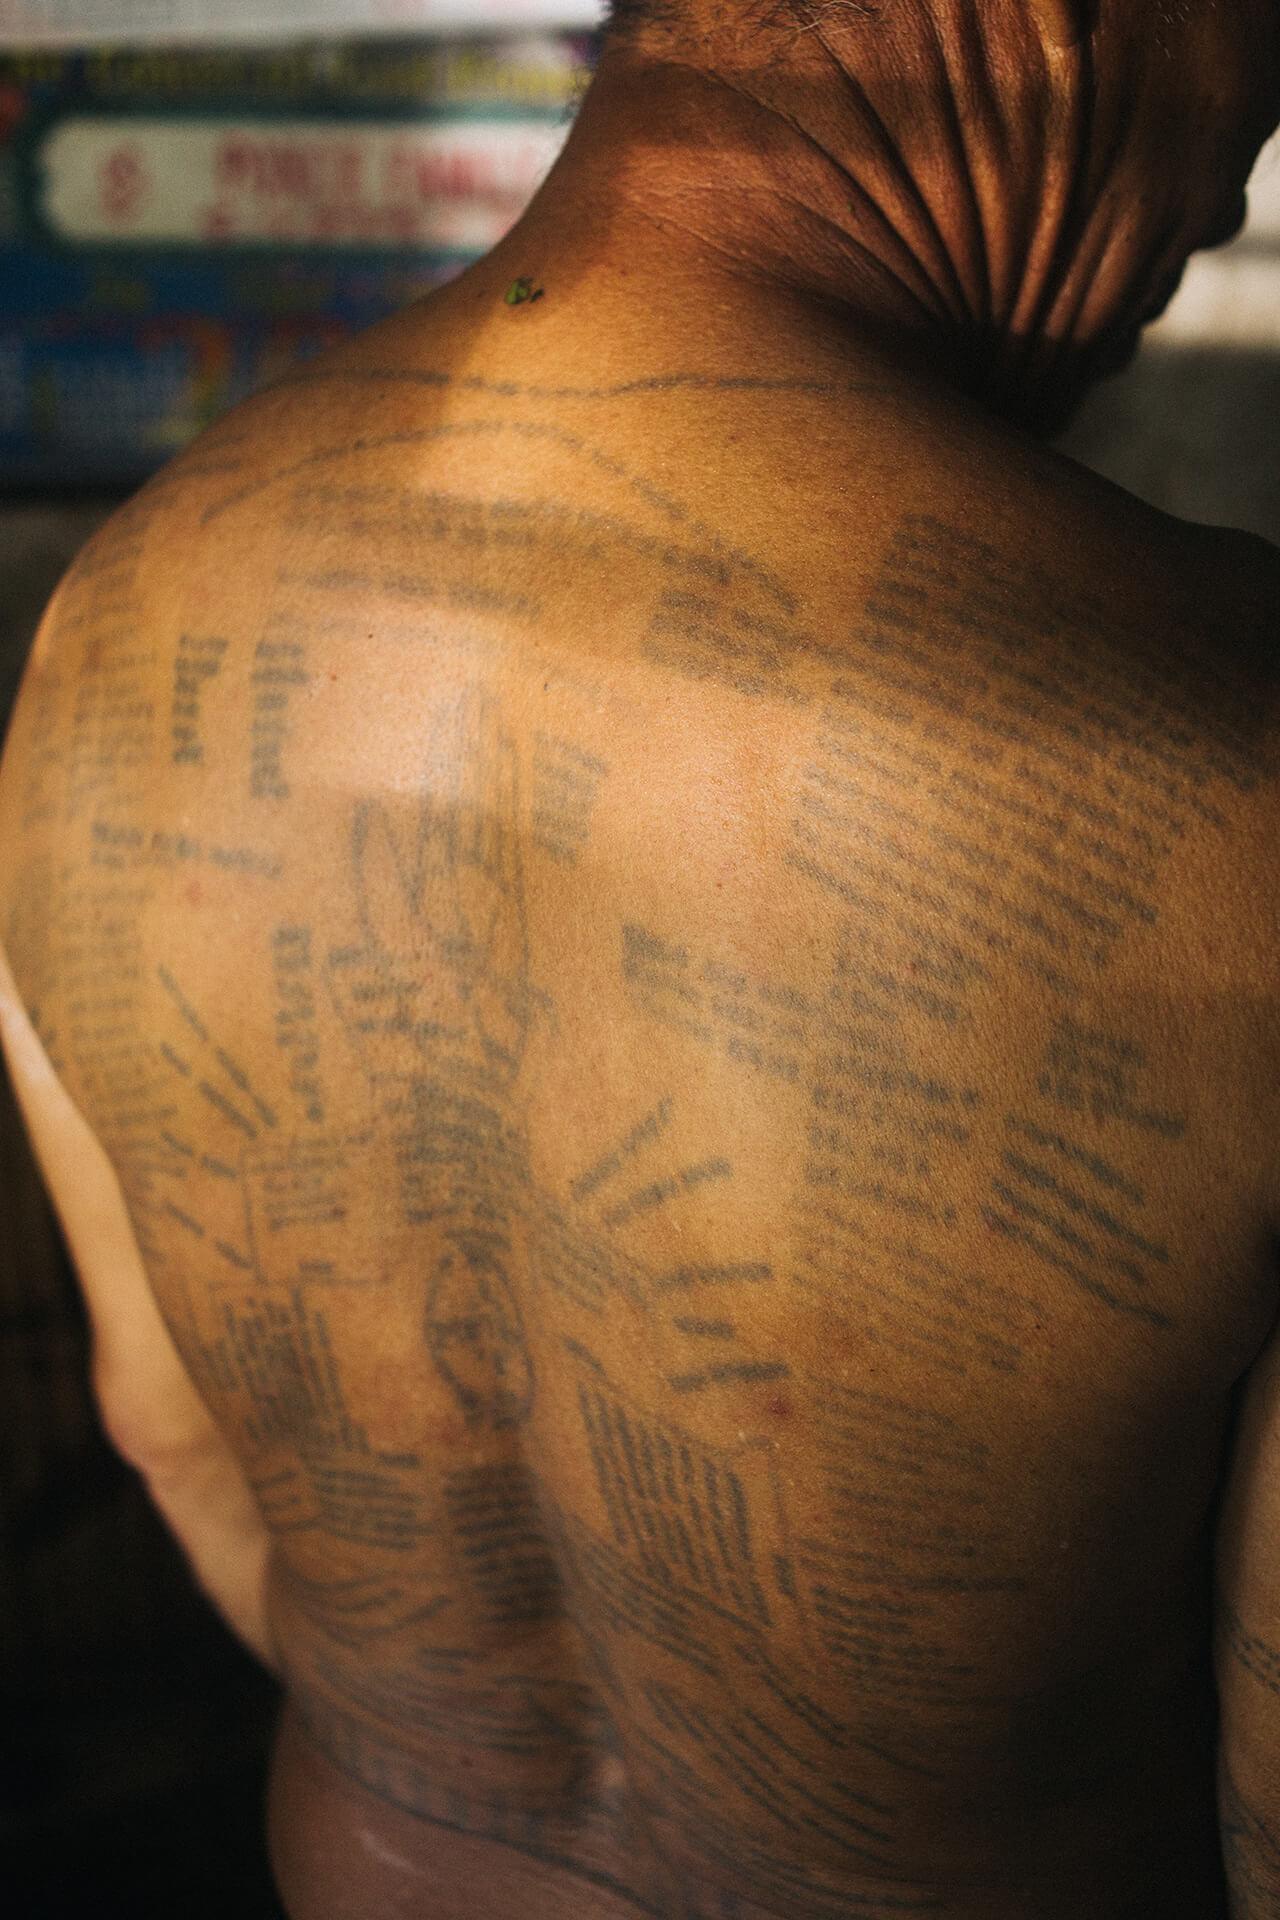 Quirino's back also boasts of elaborate patik (tattoo) of orasyones